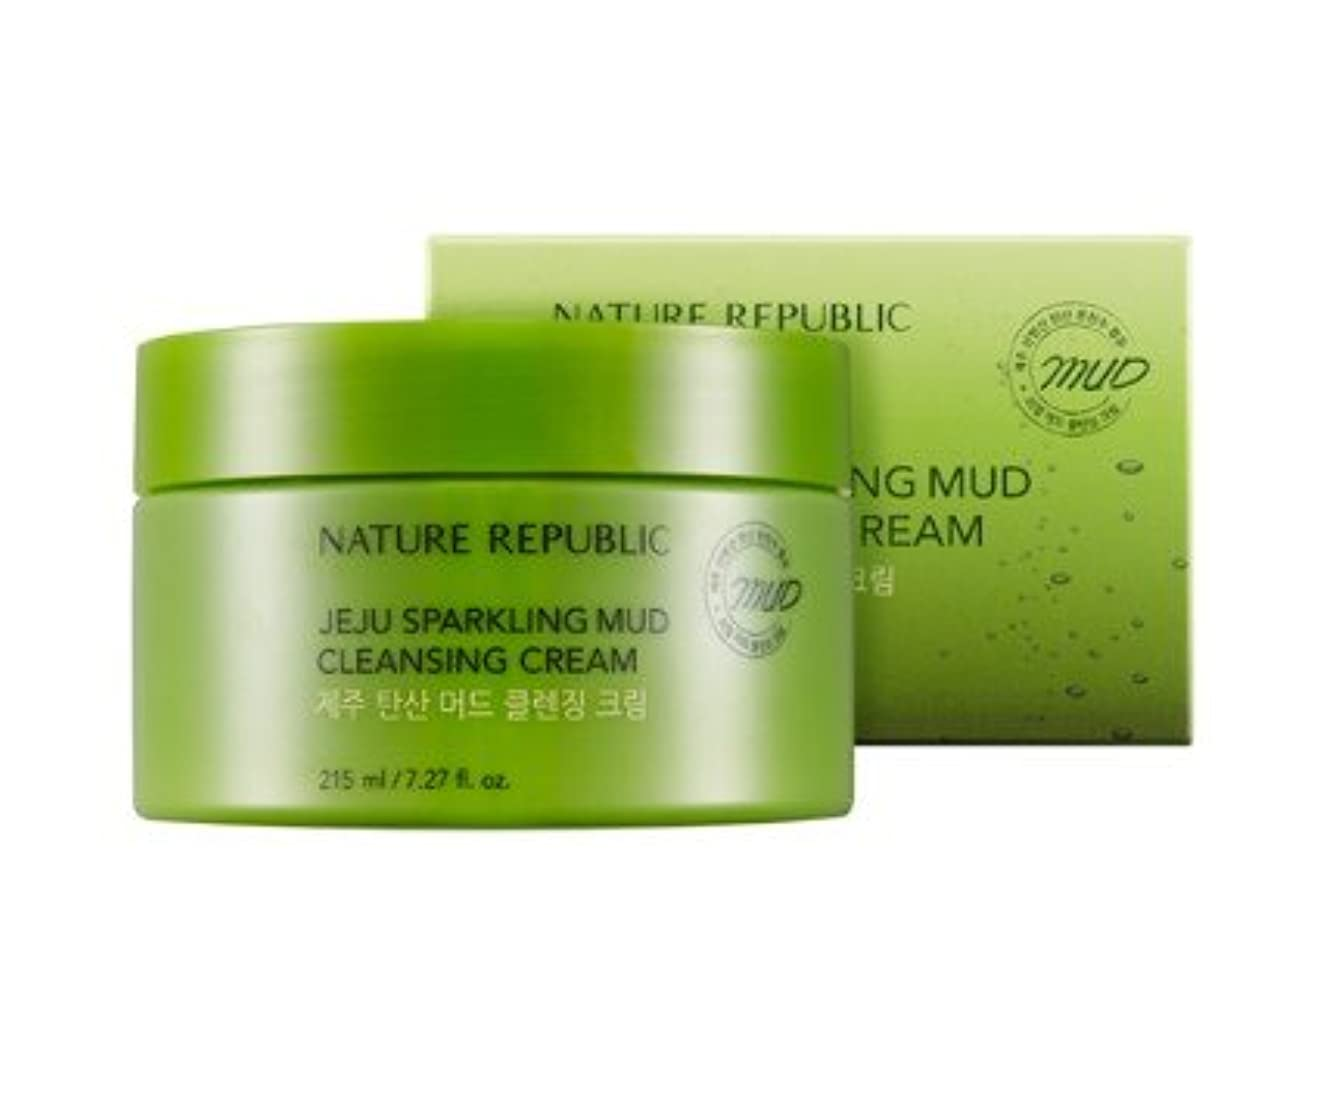 Nature republic Jeju Sparkling Mud Cleansing Cream ネイチャーリパブリック チェジュ炭酸マッド クレンジングクリーム 215ML [並行輸入品]